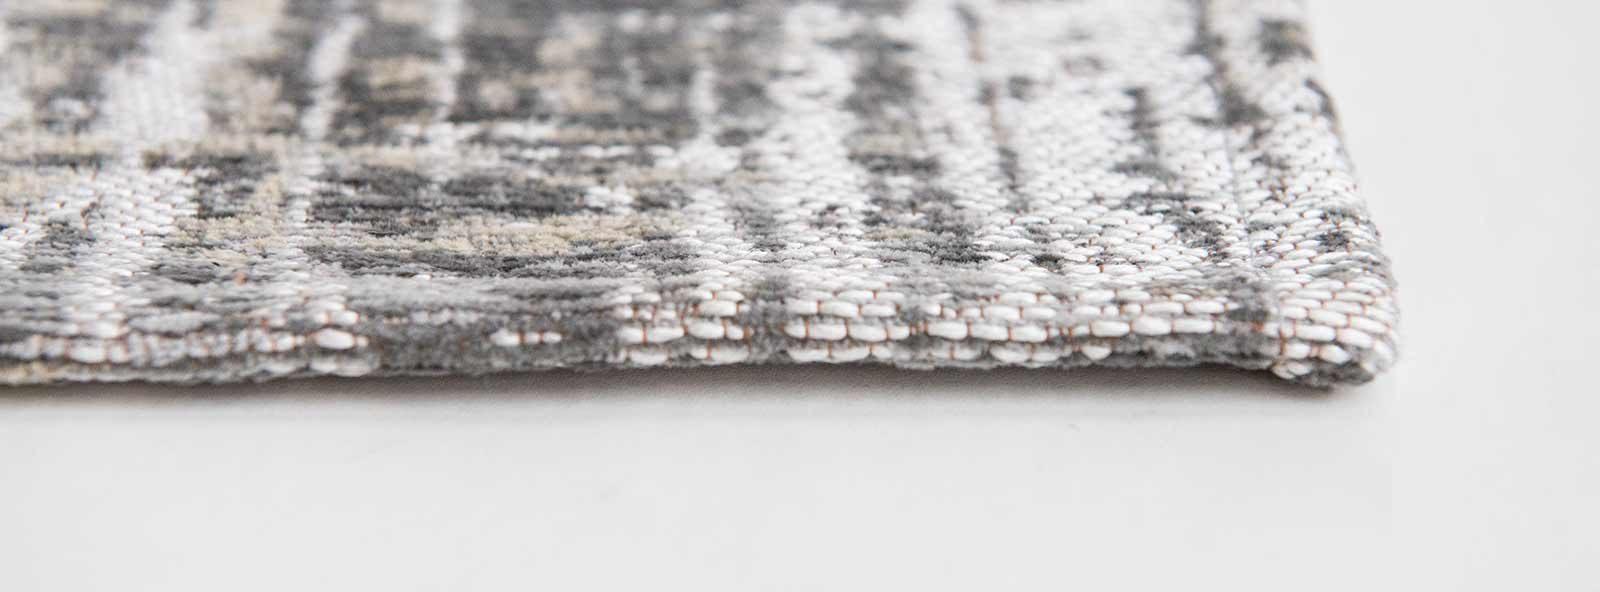 alfombras Louis De Poortere LX8716 Atlantic Streaks Coney Grey side